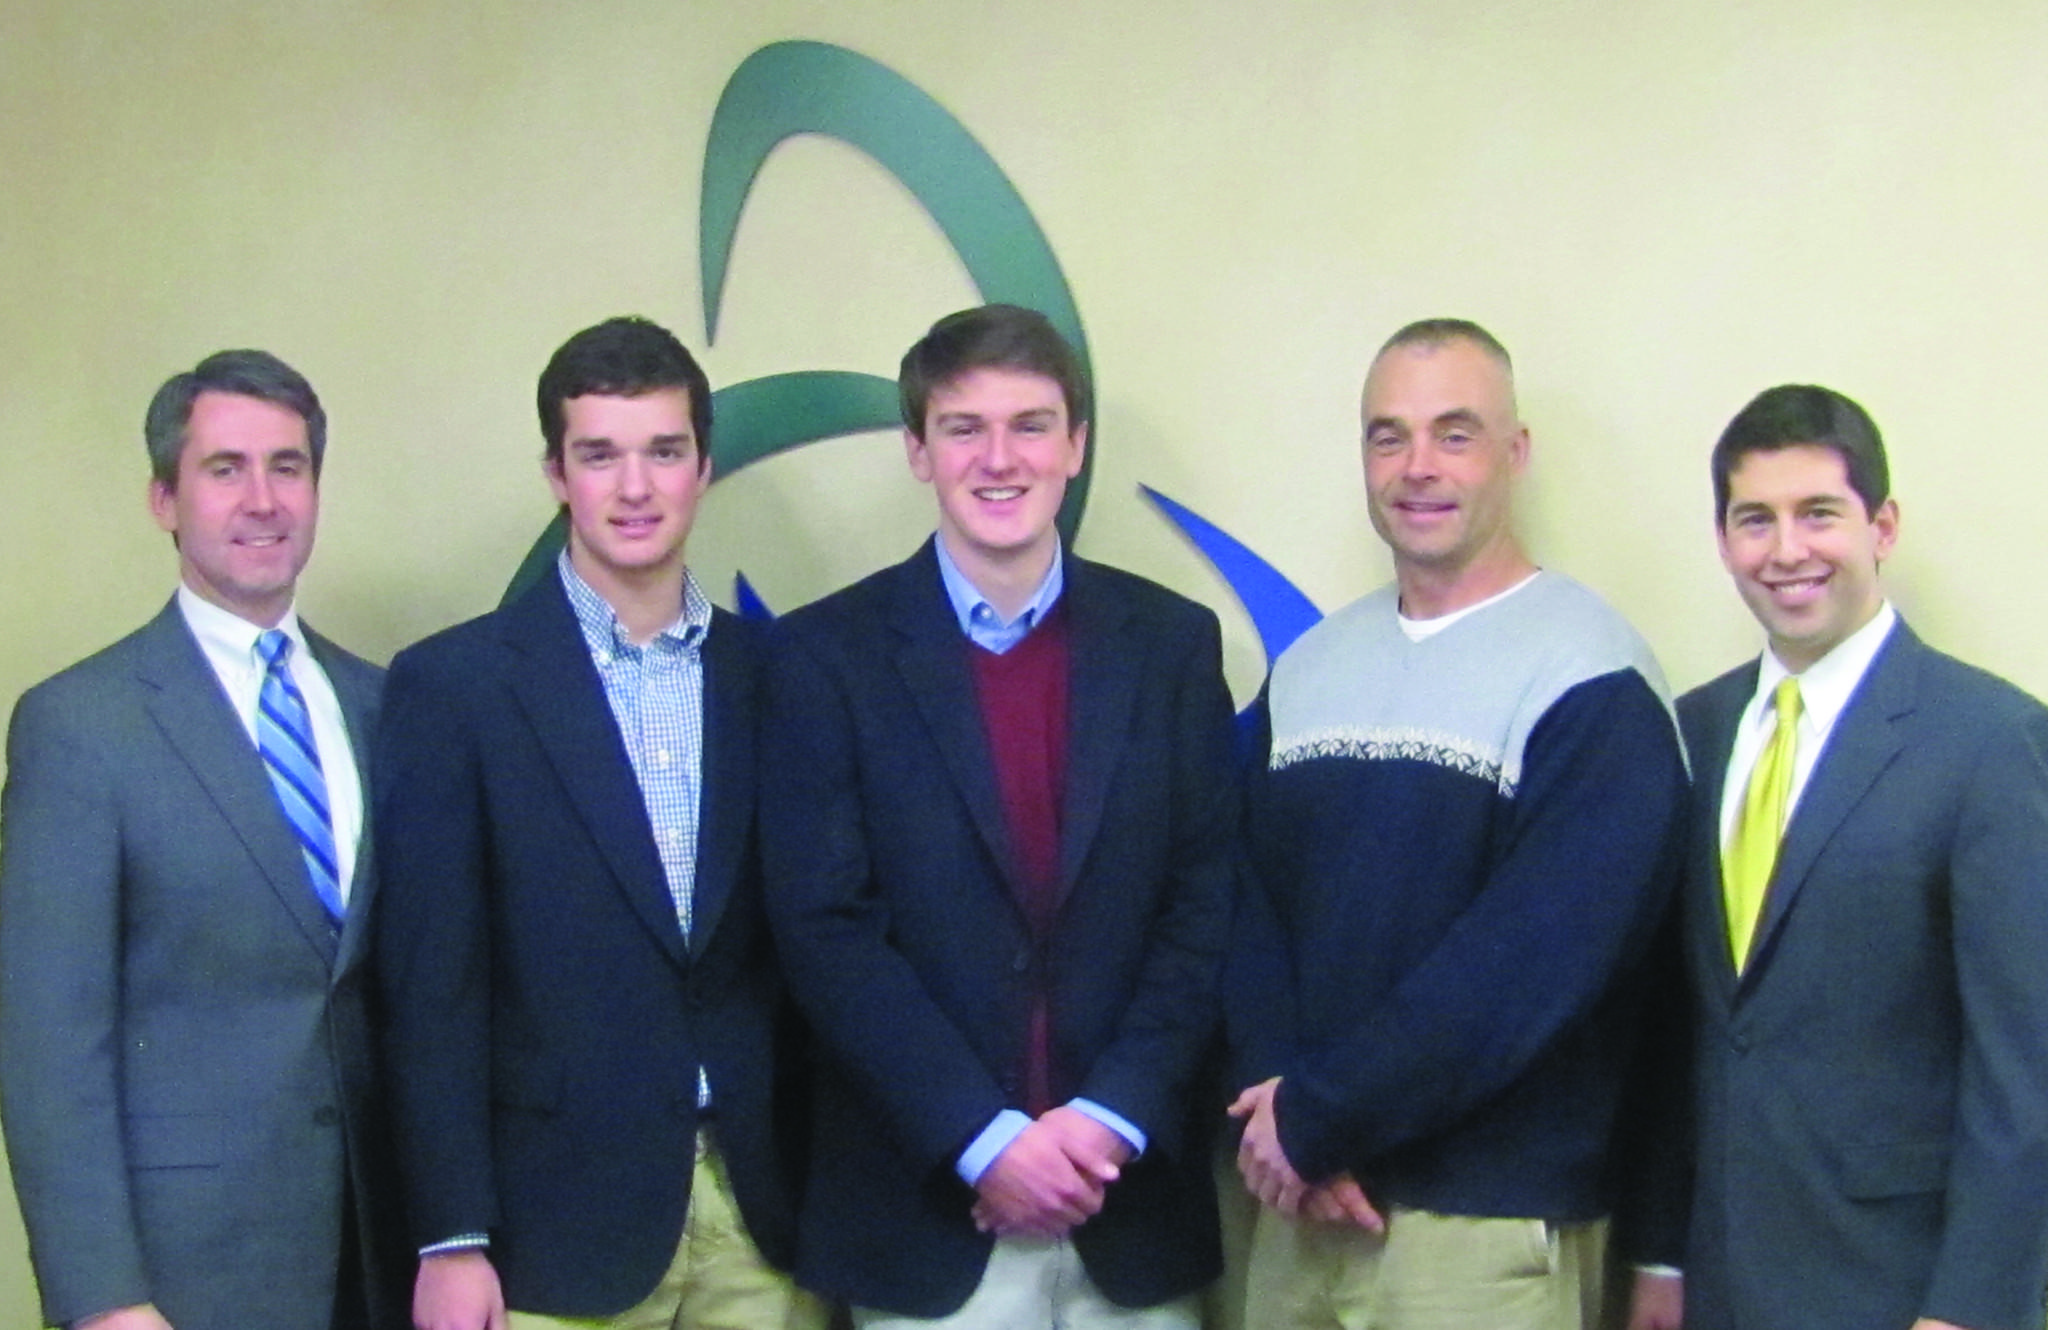 From left to right: Denis Horrigan, Brian Gellman, Jakob Gattinger, SHS Stock Market Club advisor Robert Avery, Jarrett Solomon.